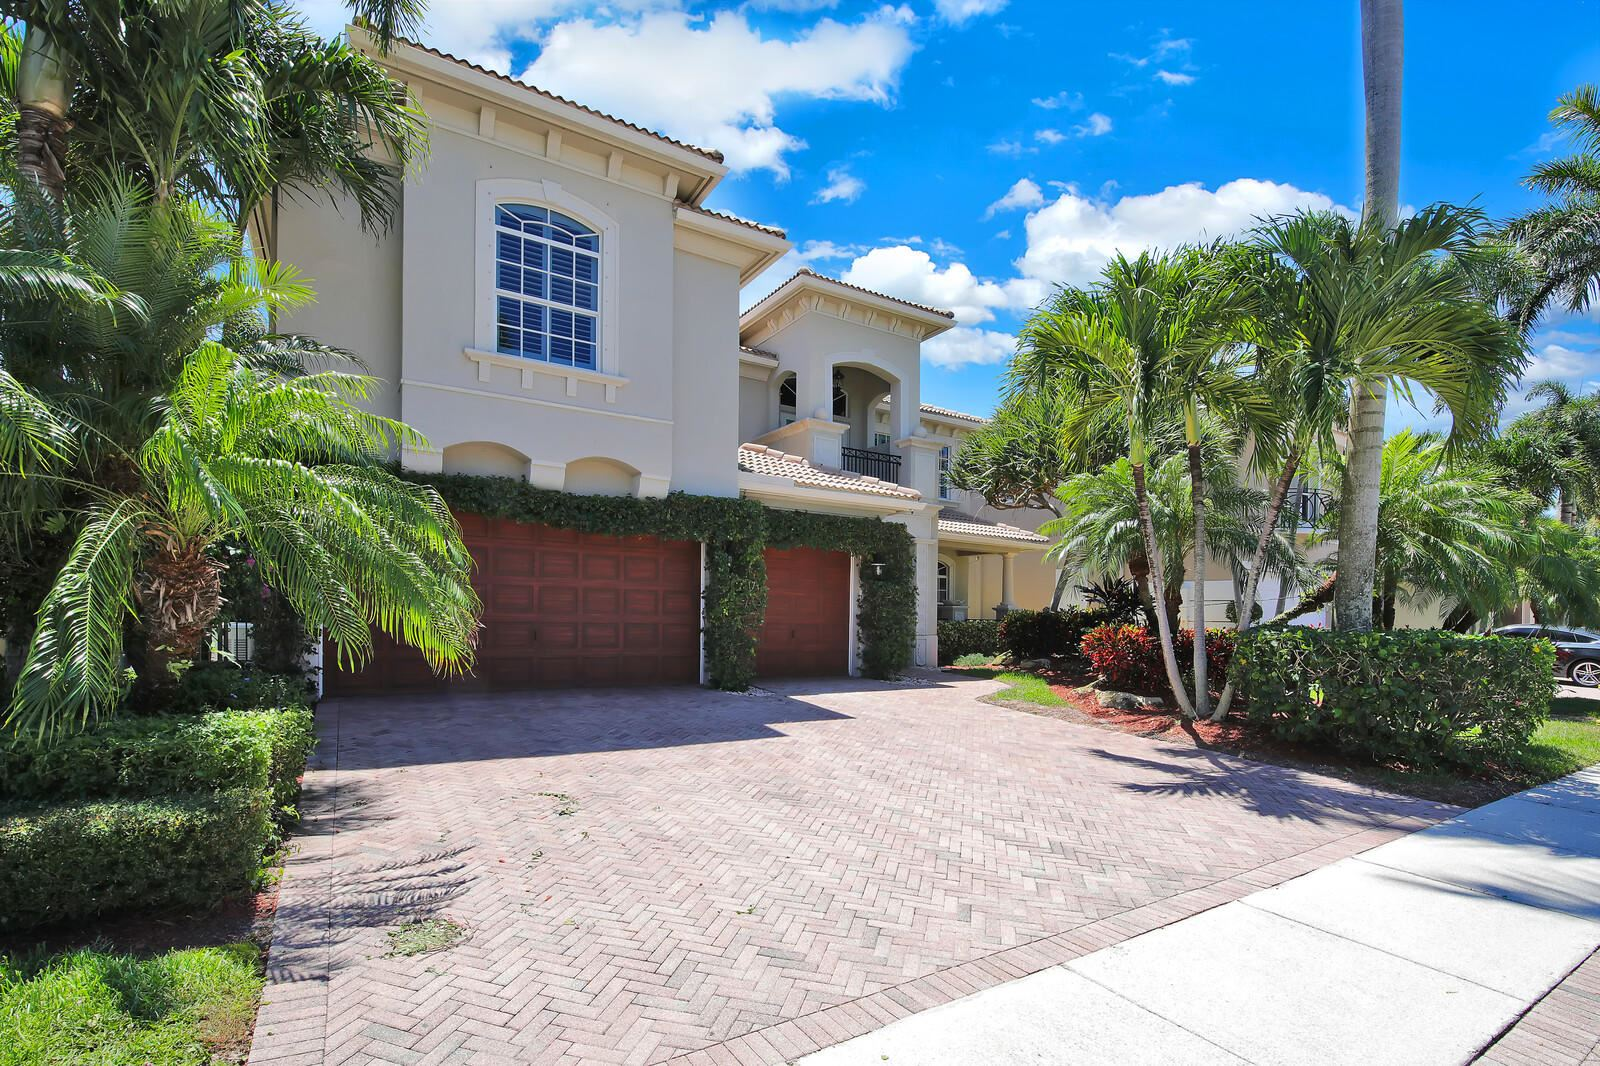 Photo of 809 Floret Drive, Palm Beach Gardens, FL 33410 (MLS # RX-10632519)